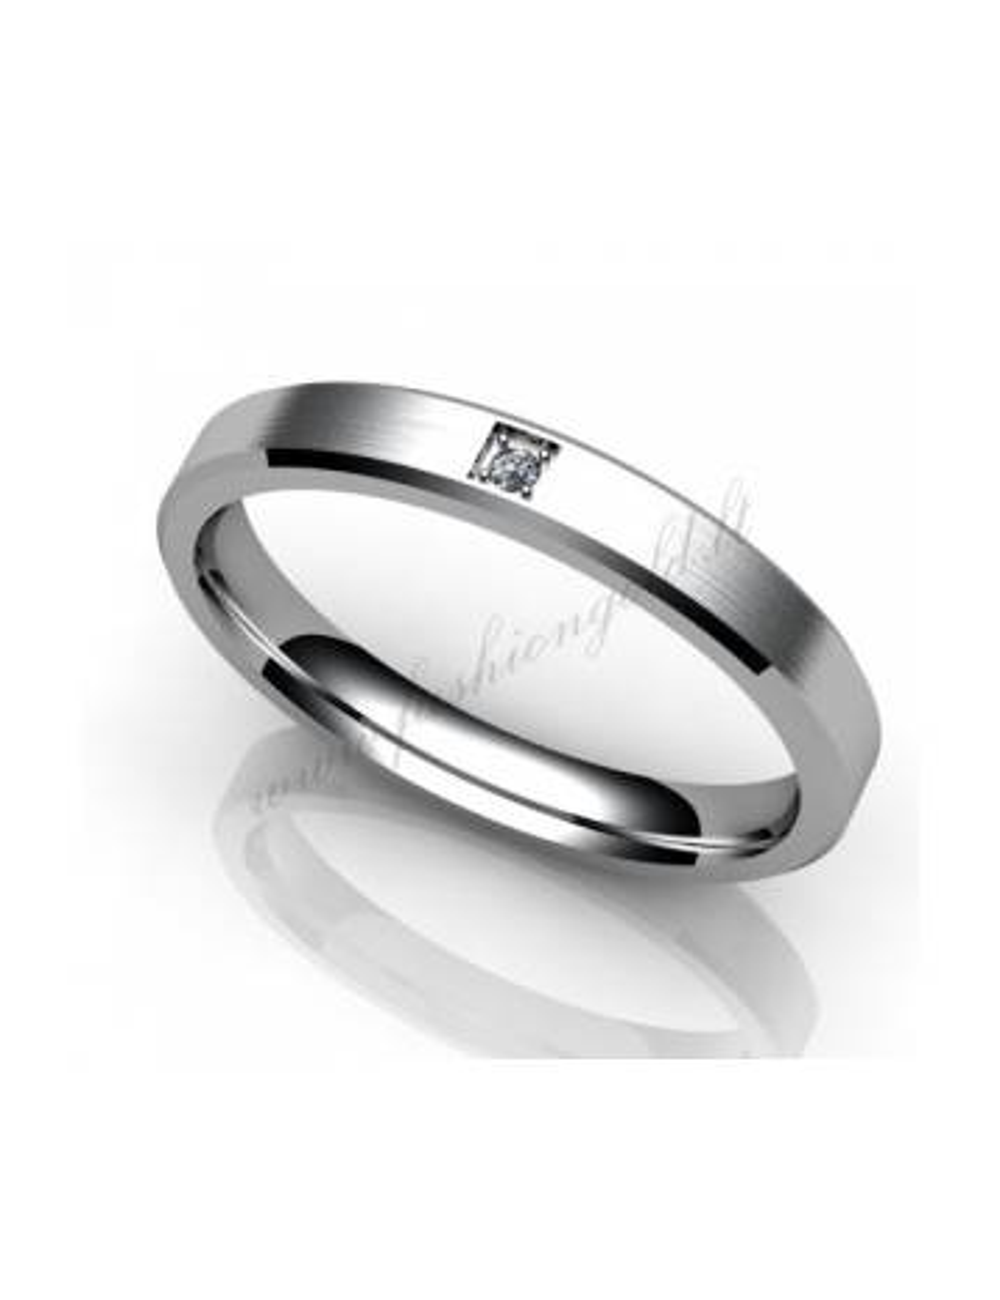 "WEDDING RING ""YELLOW PROMISE"" with diamond"